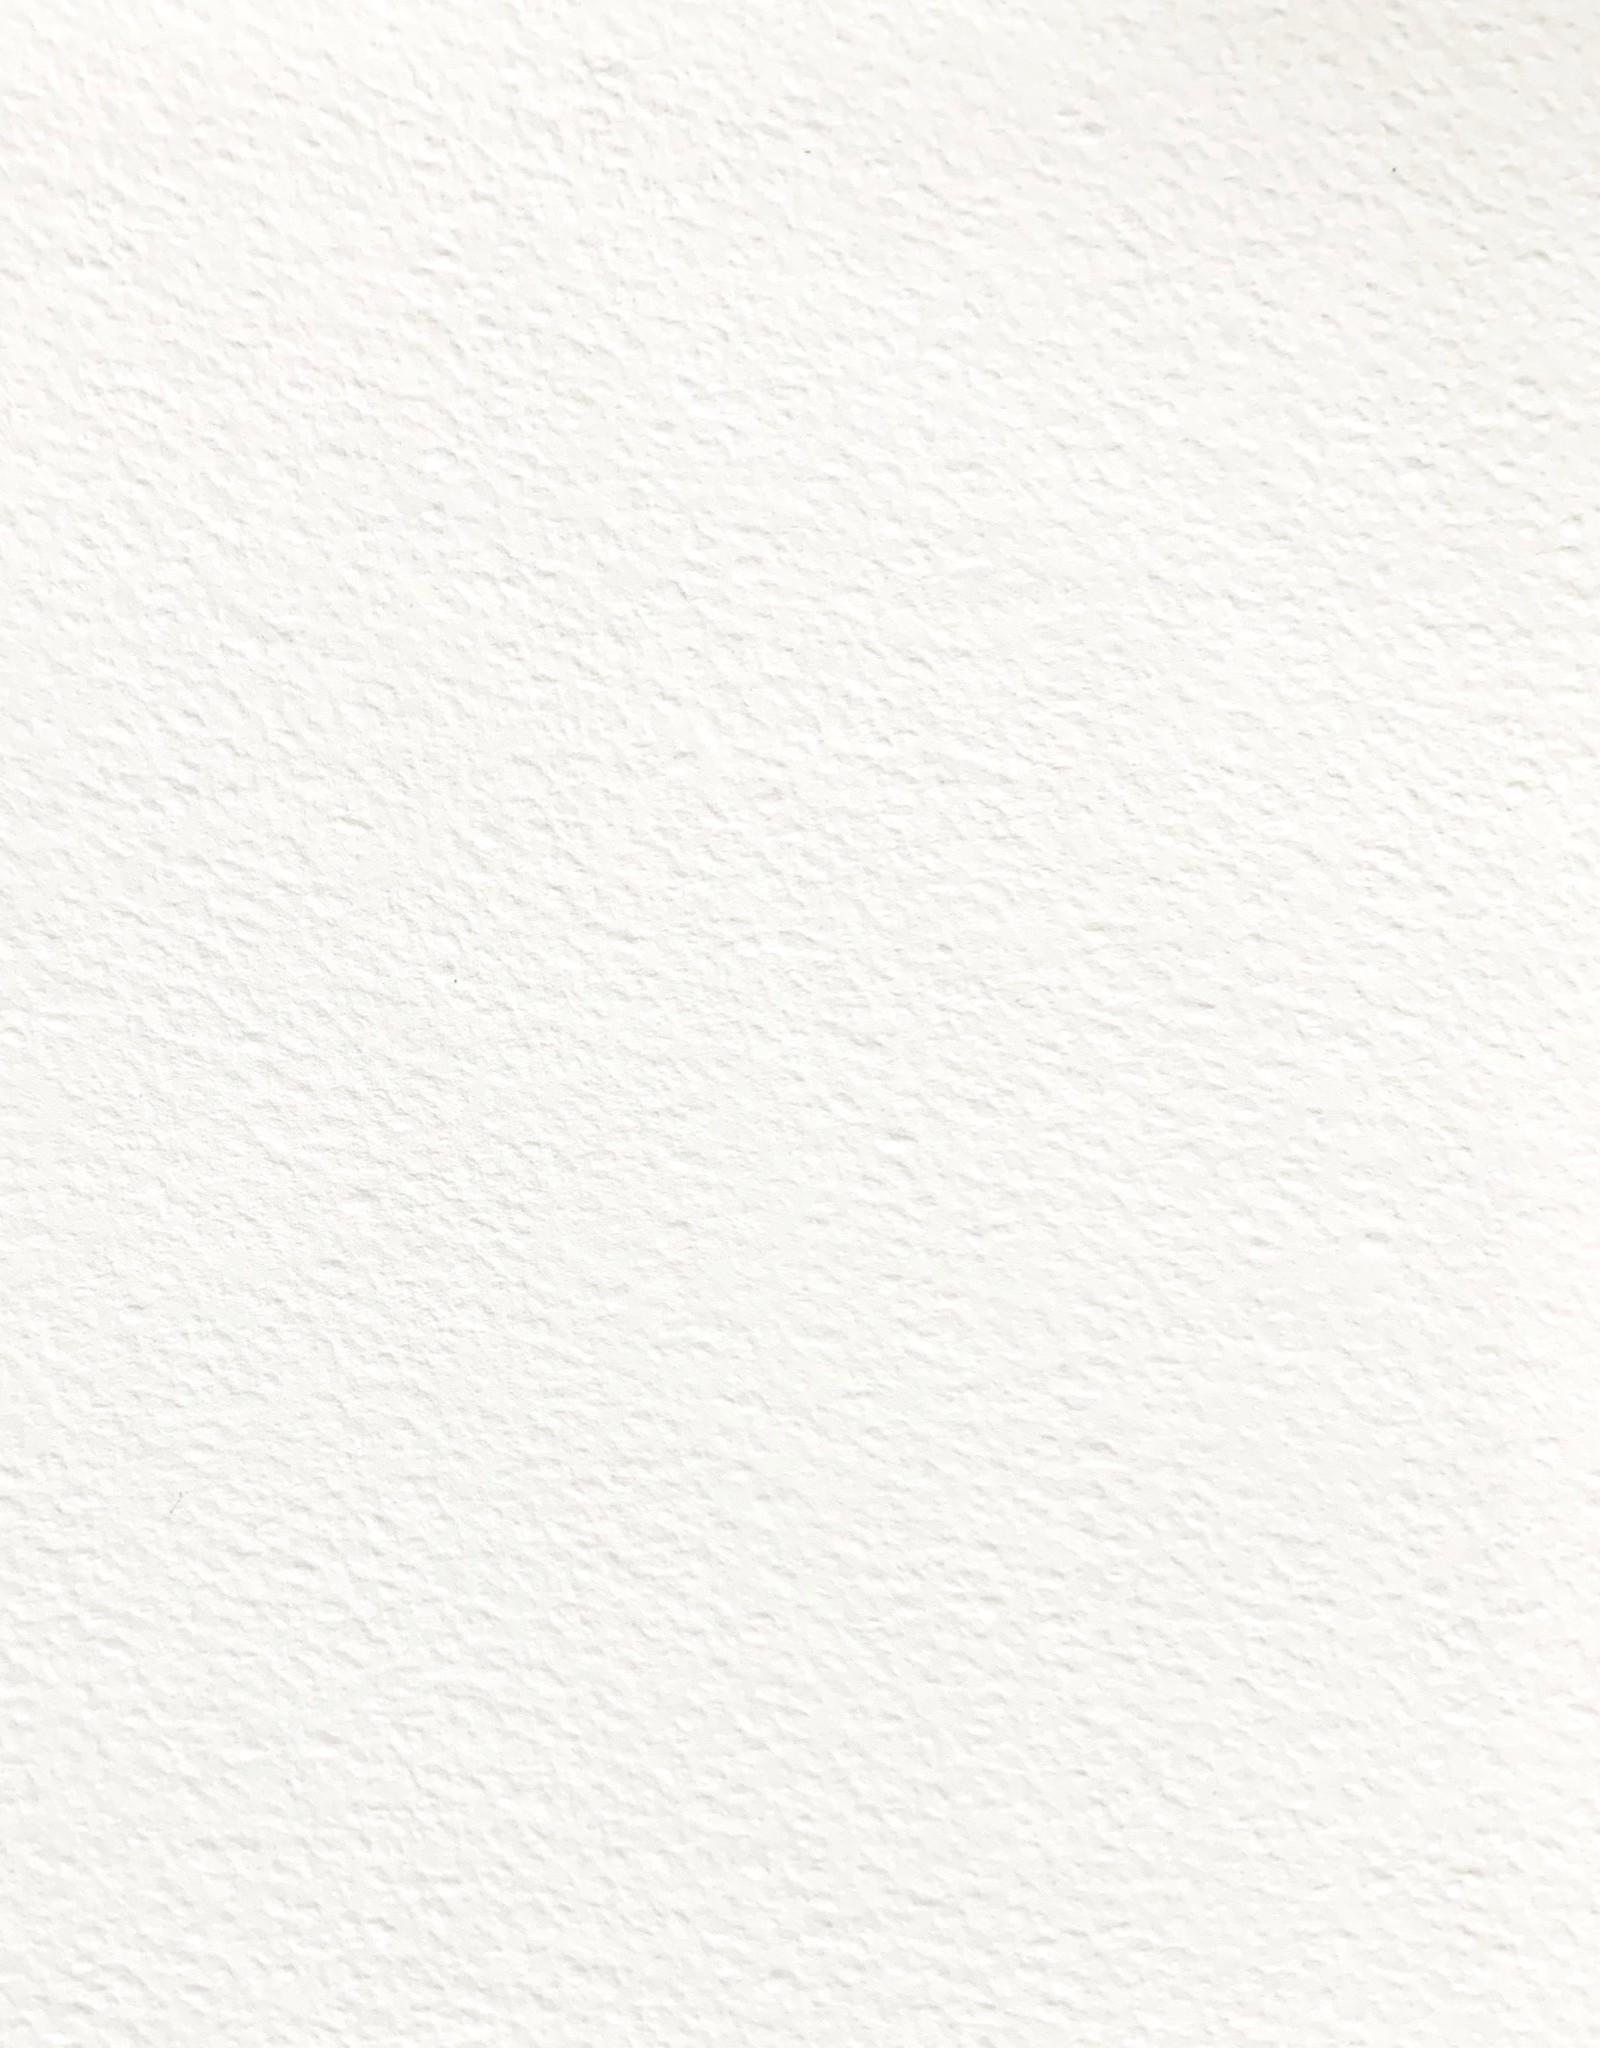 "Lanaquarelle Watercolor, 140#, Cold Press, 22"" x 30"""